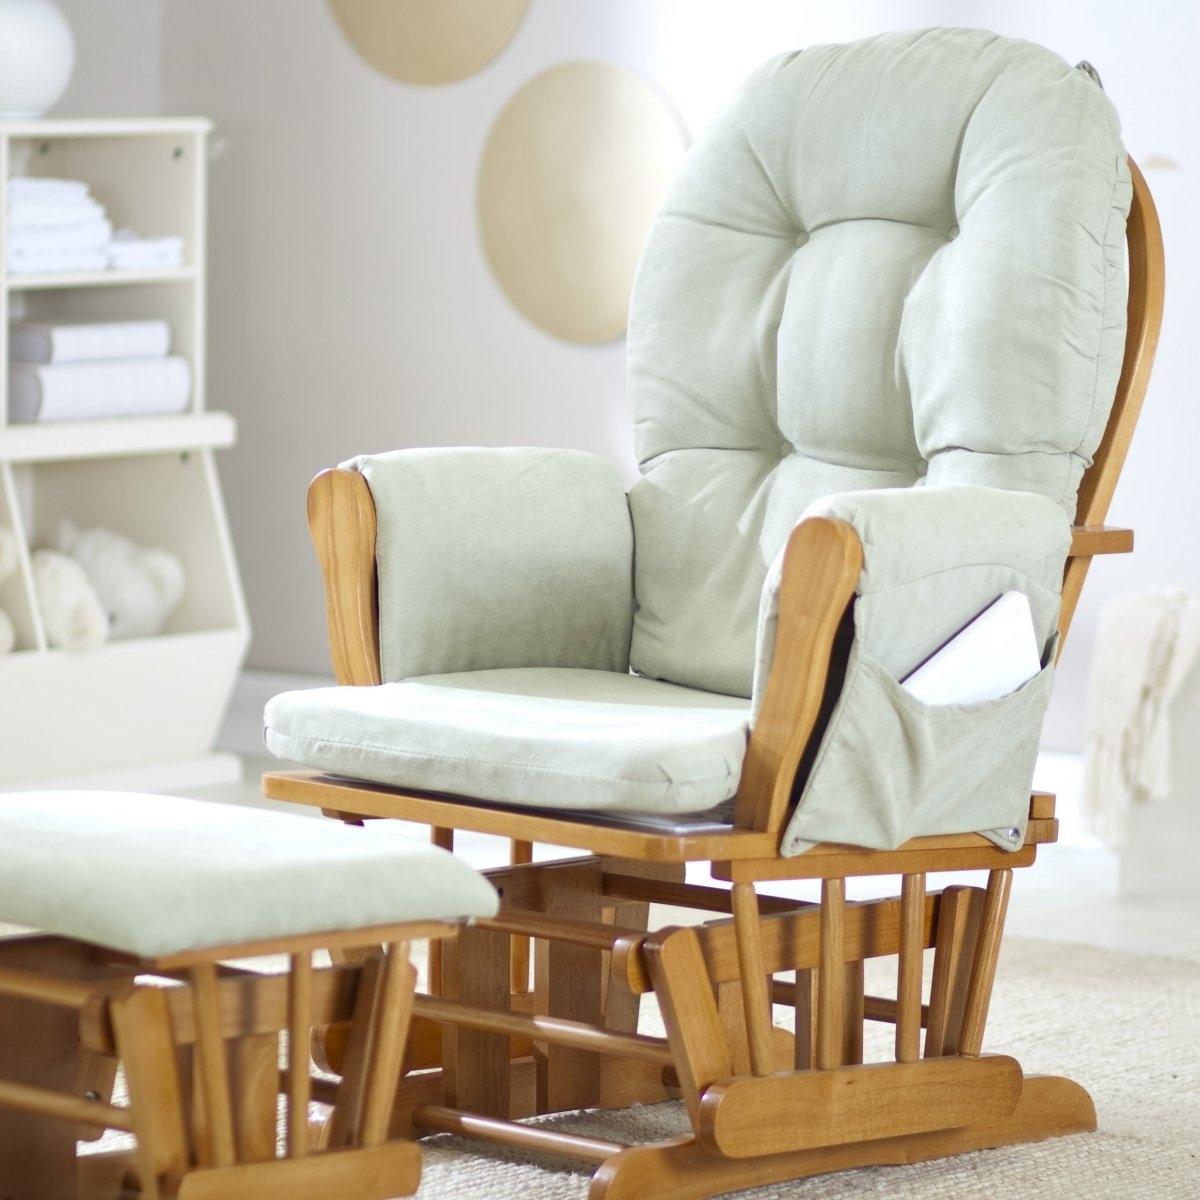 Famous Nursery Rocking Chair Target – Nursery Rocking Chair For Mom And Within Rocking Chairs For Nursery (View 7 of 15)